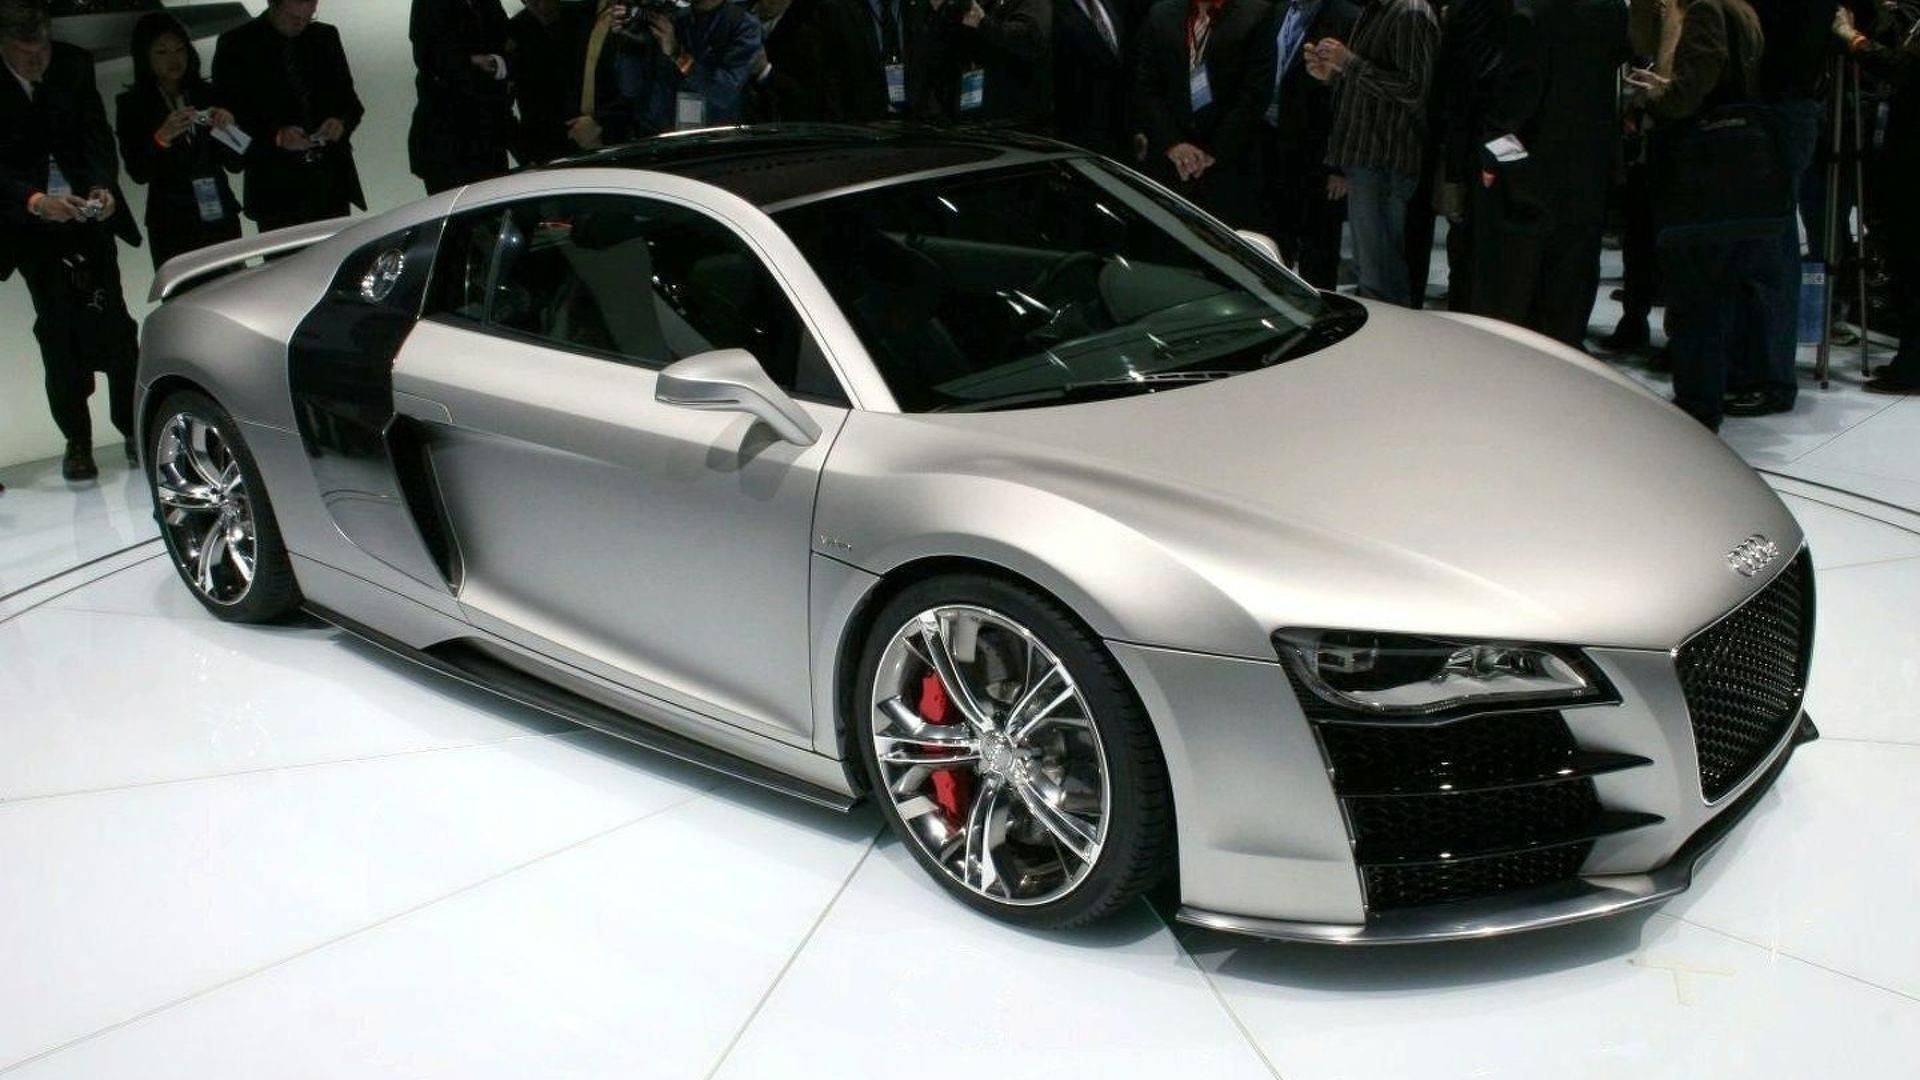 2008 Audi R8 V12 TDI: Concept We Forgot